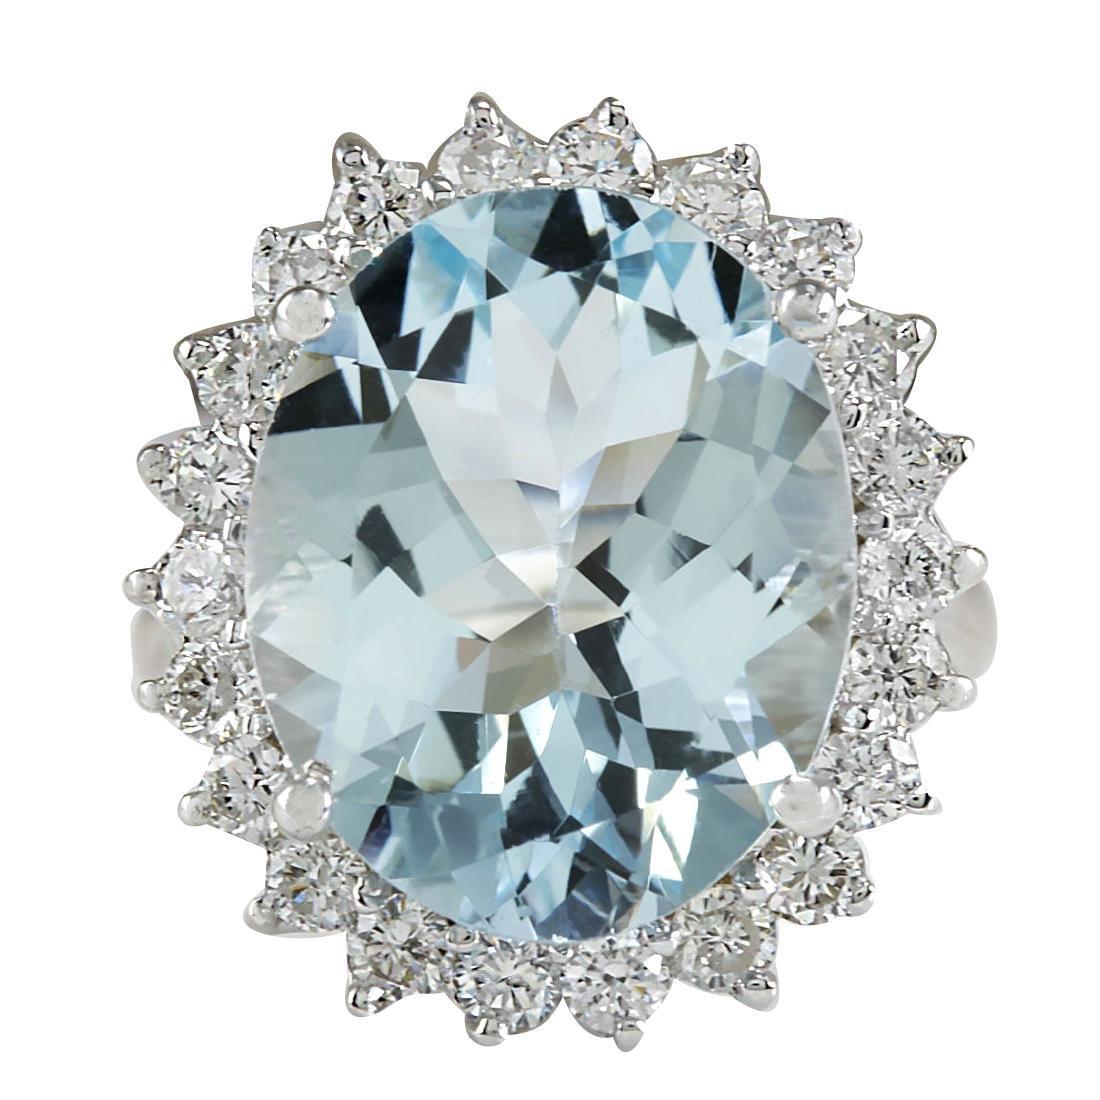 8.10CTW Natural Aquamarine And Diamond Ring In 18K